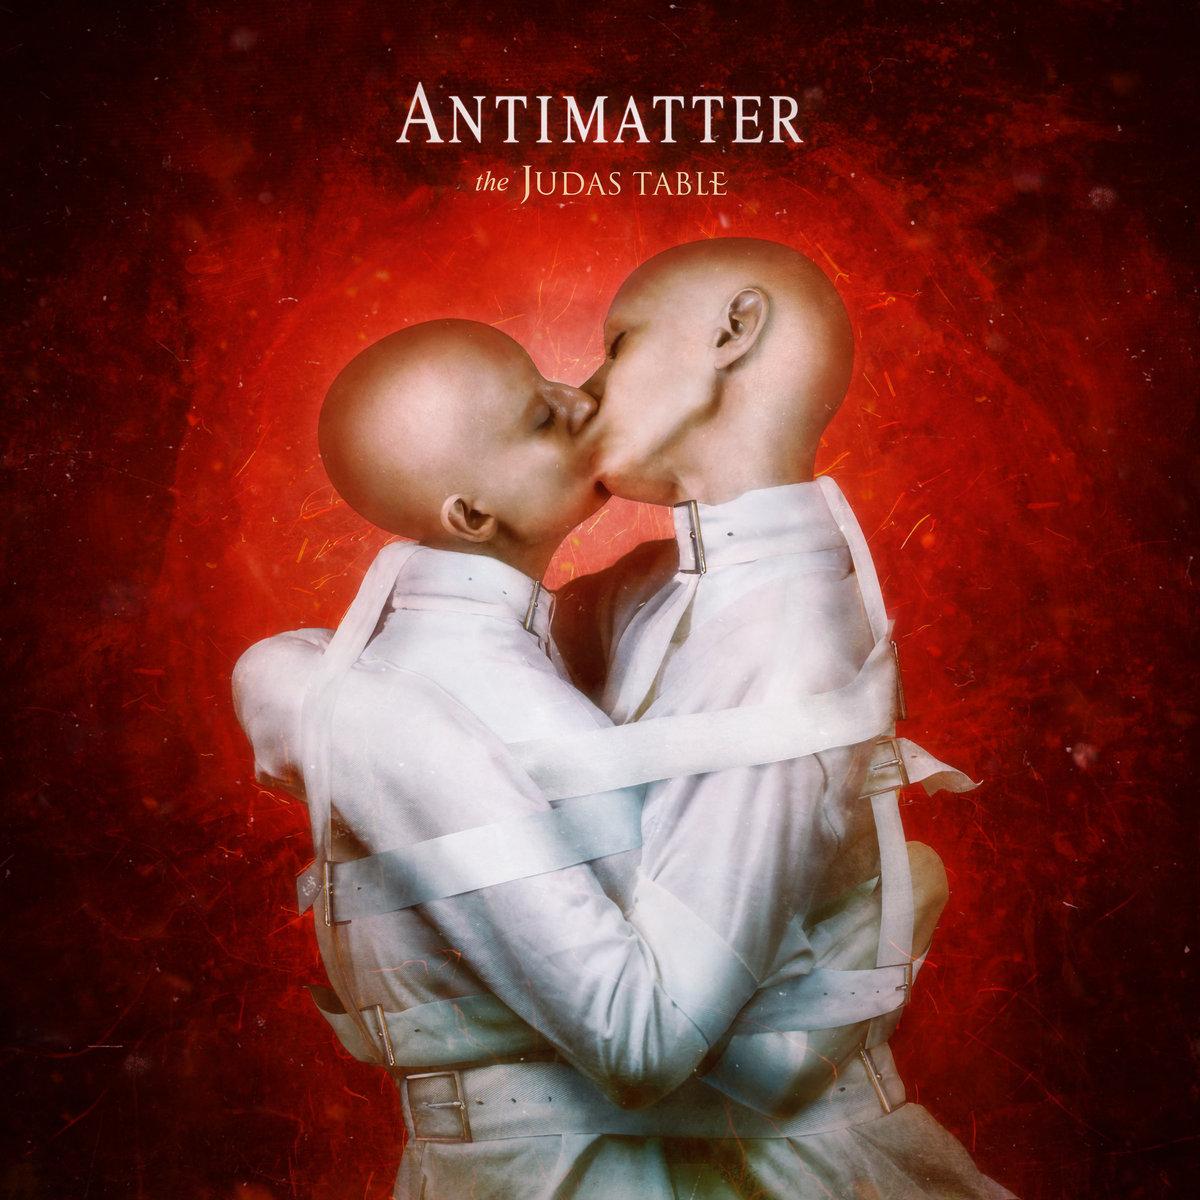 Antimatter: The Judas Table